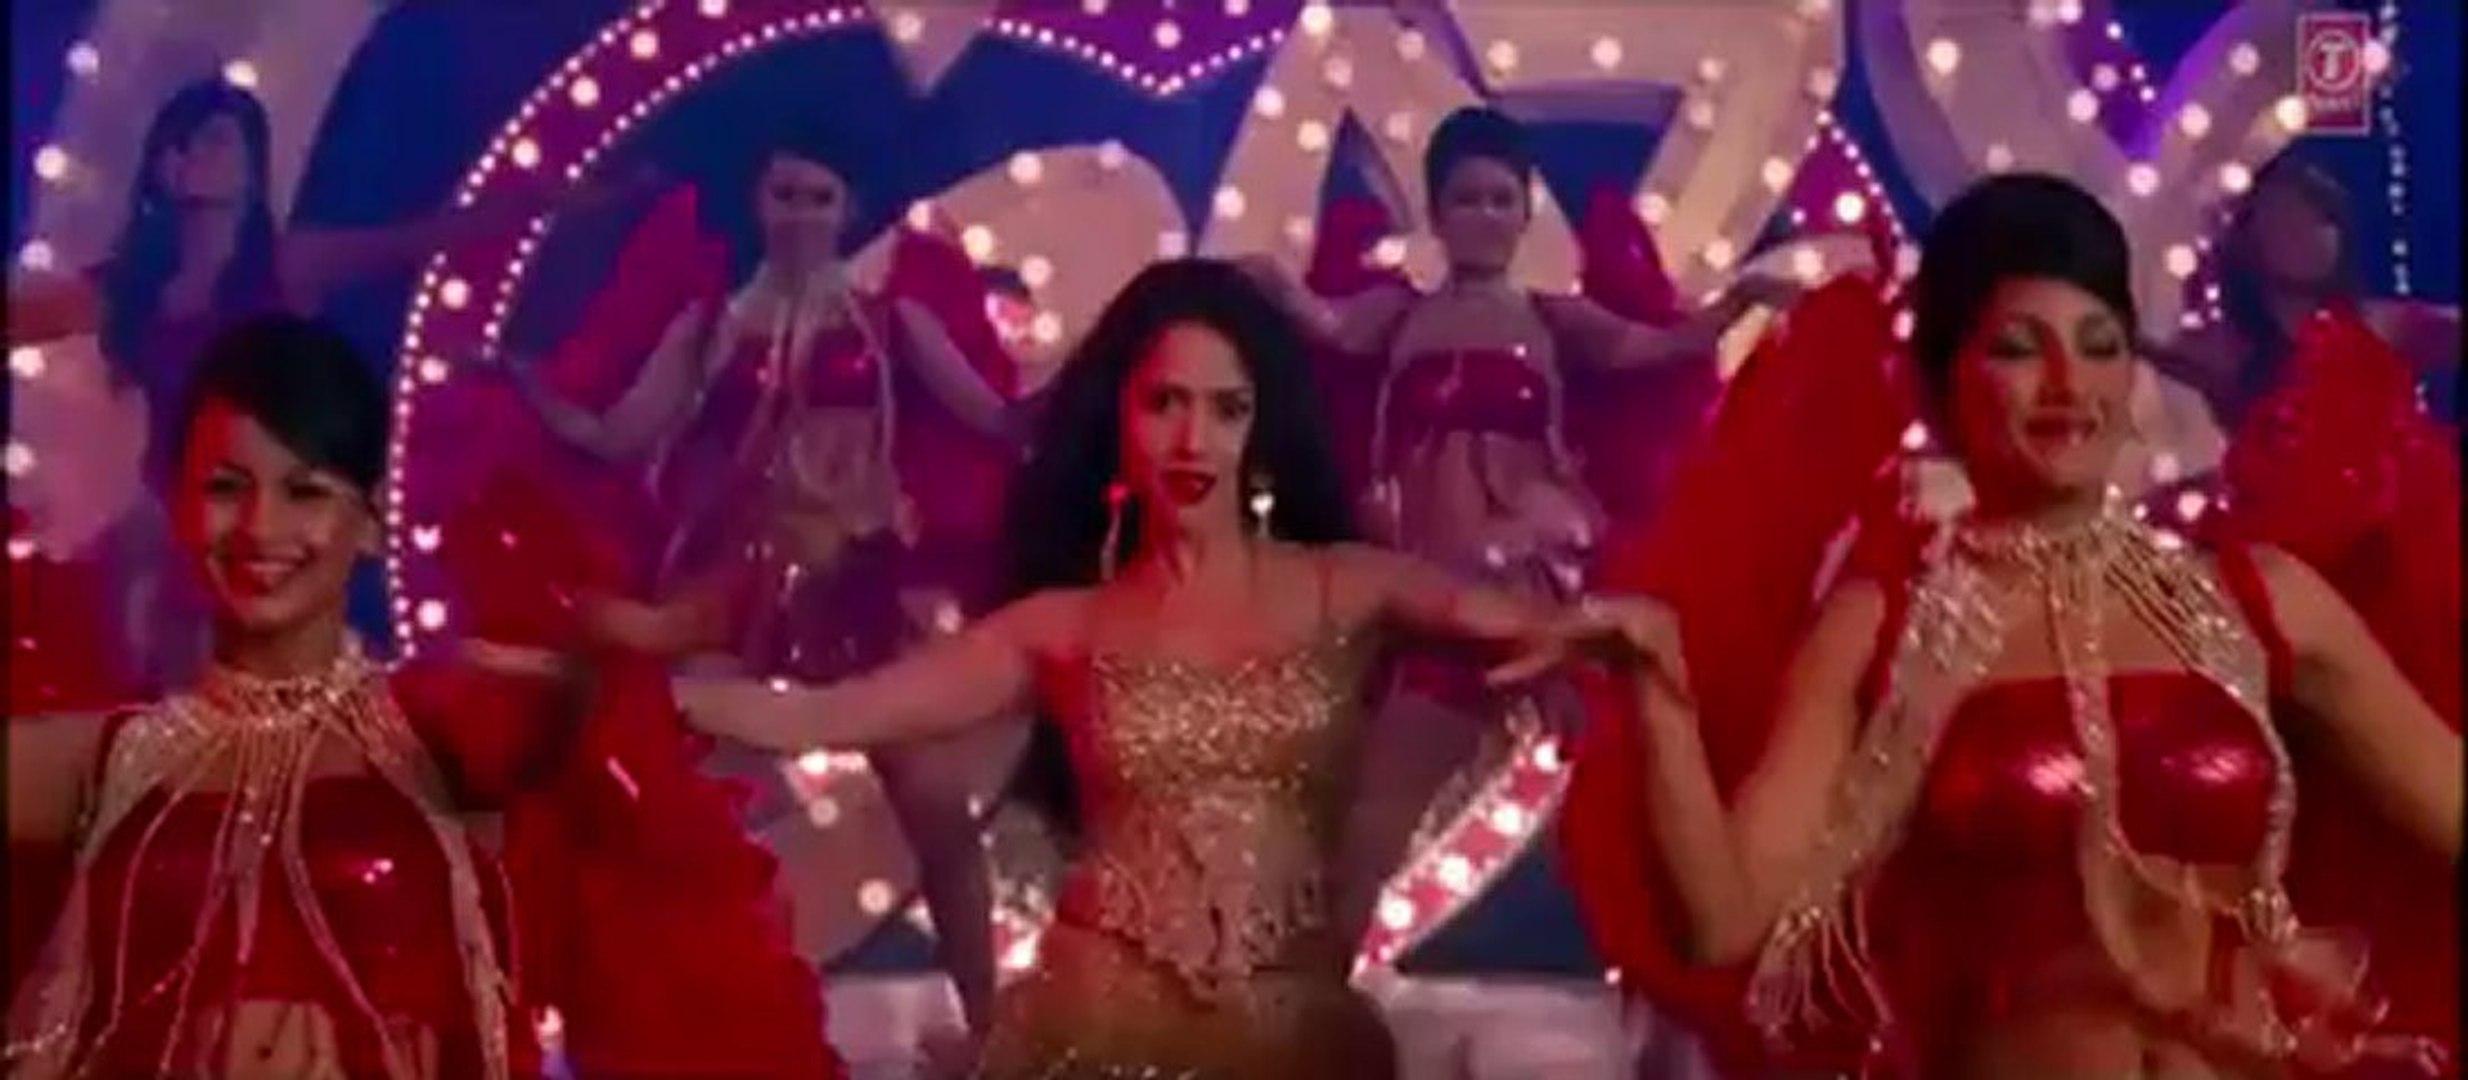 Akaash Vani - 2013 - Official Theatrical Trailer#1 (2013) HD - Kartik Tiwari - Nushrat Bharucha